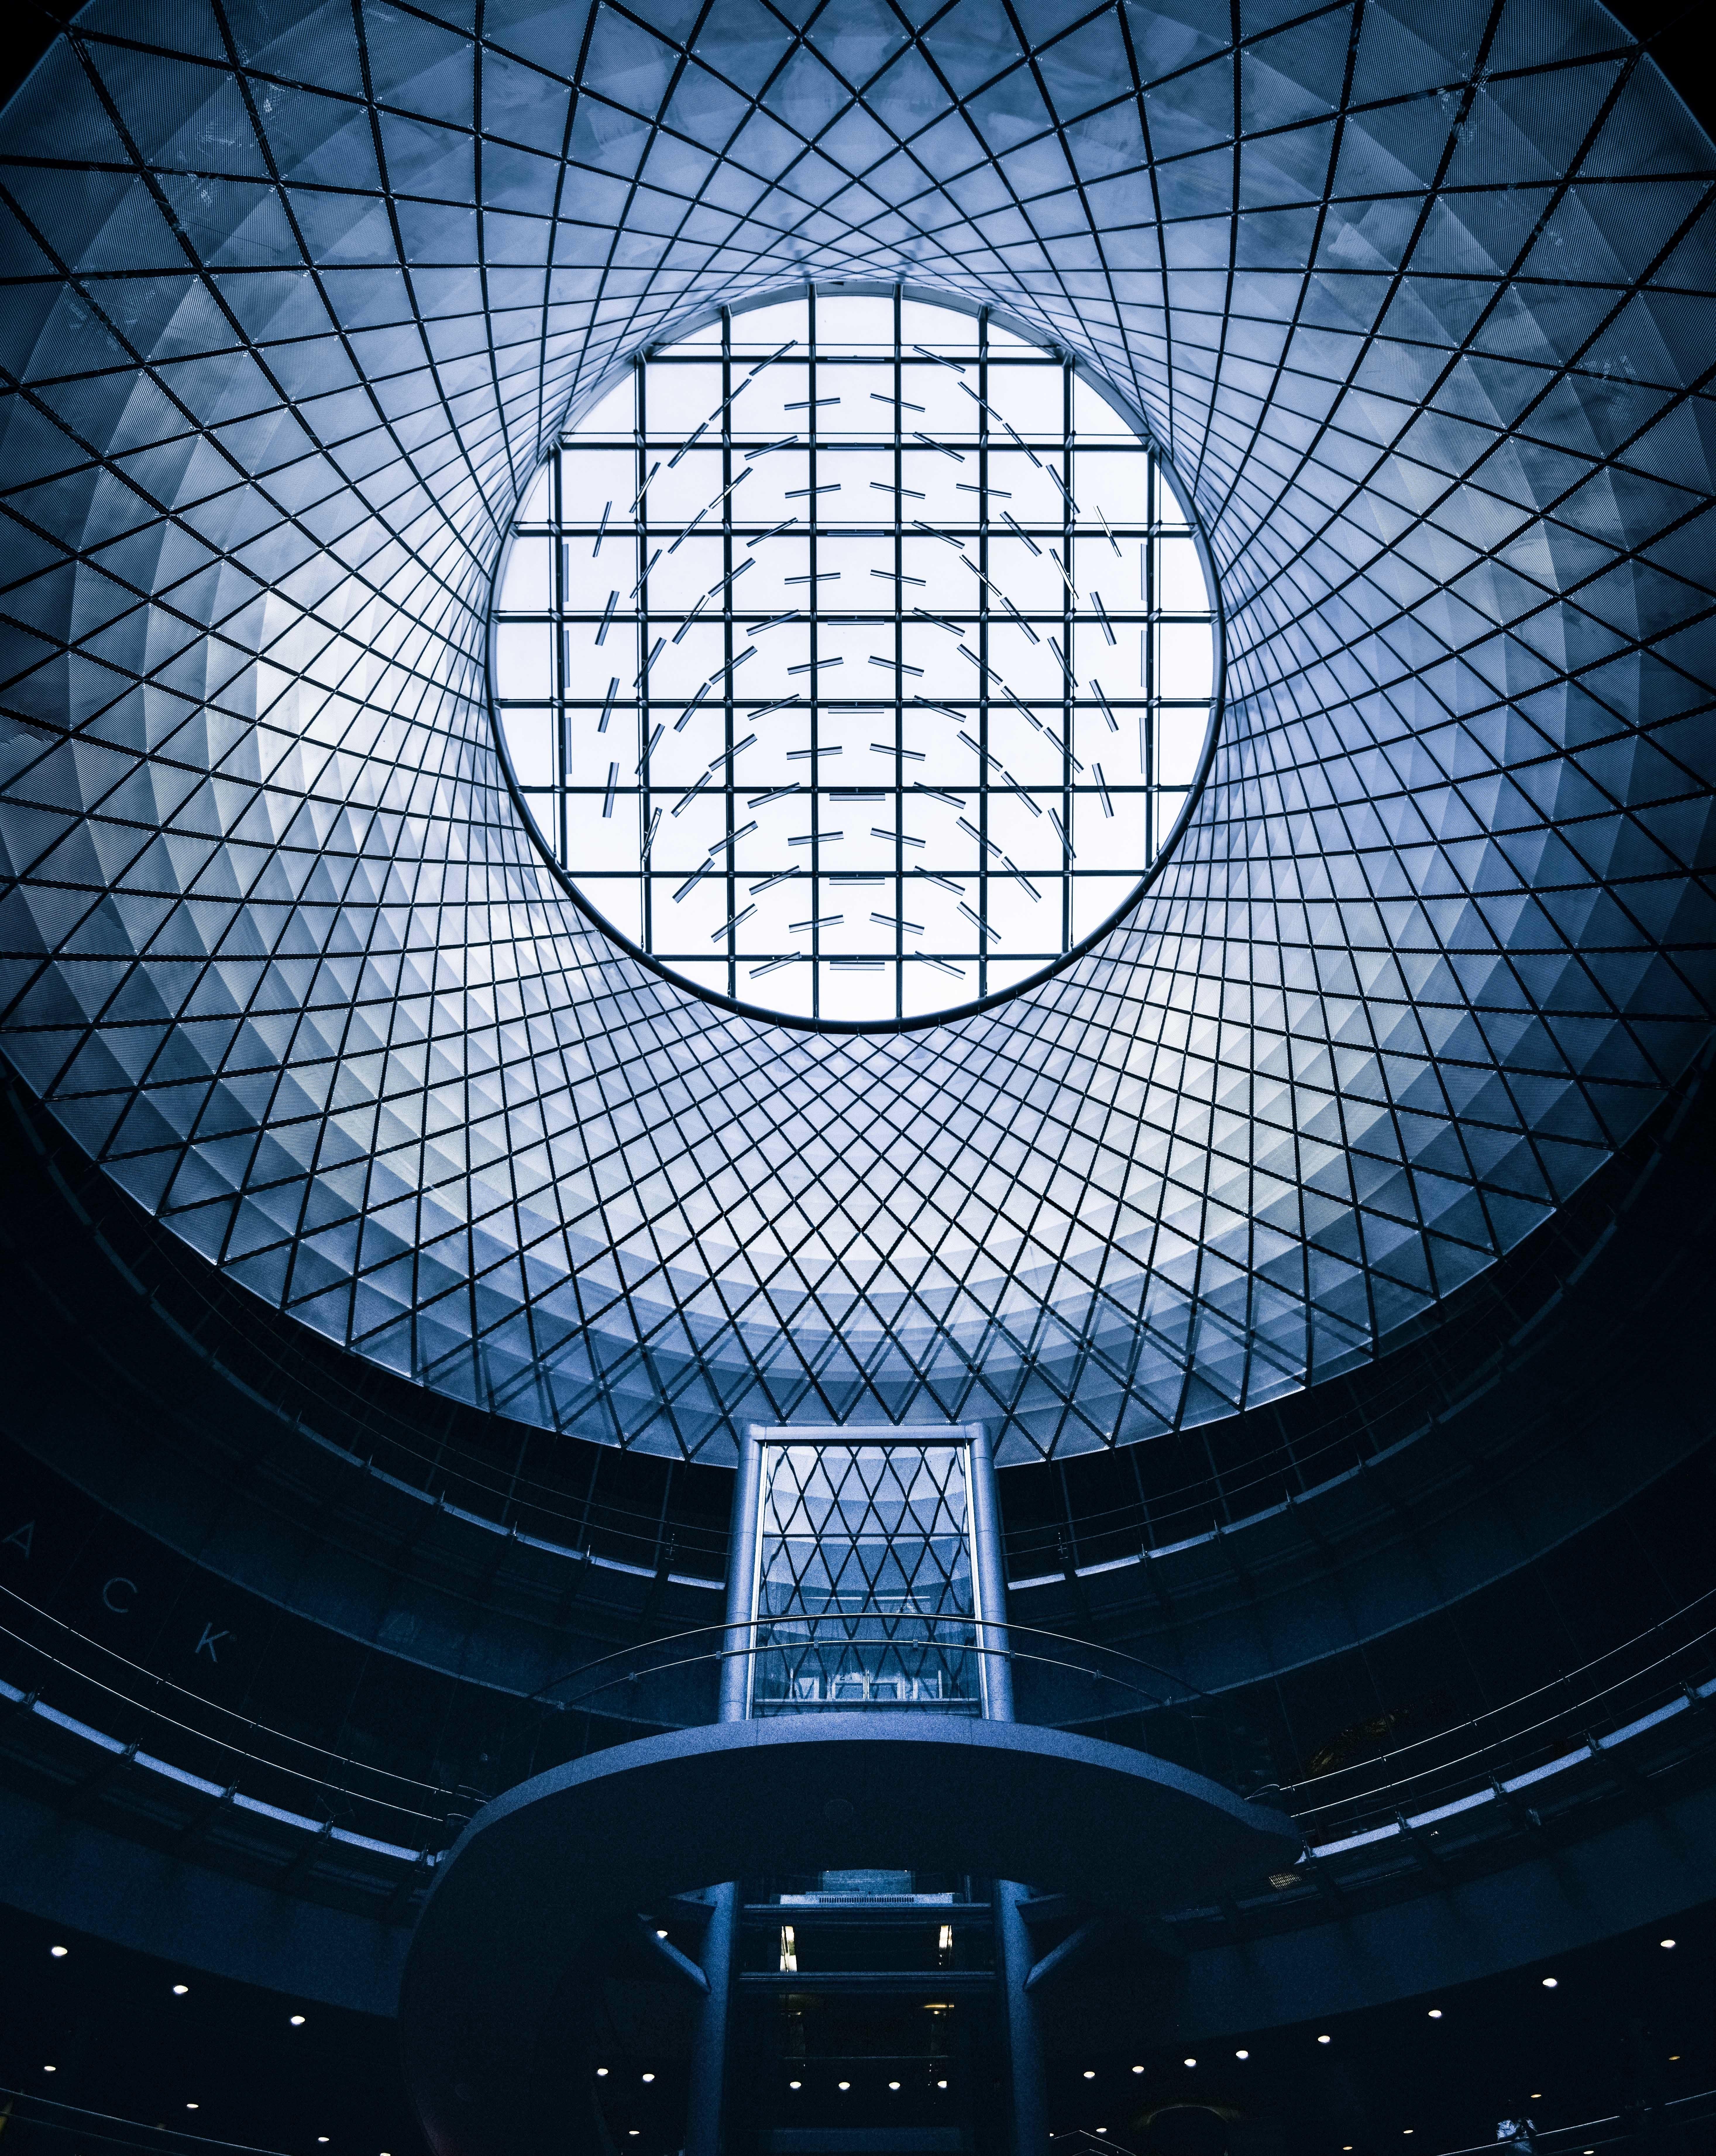 Images Gratuites Architecture Lumi 232 Re Du Soleil Verre